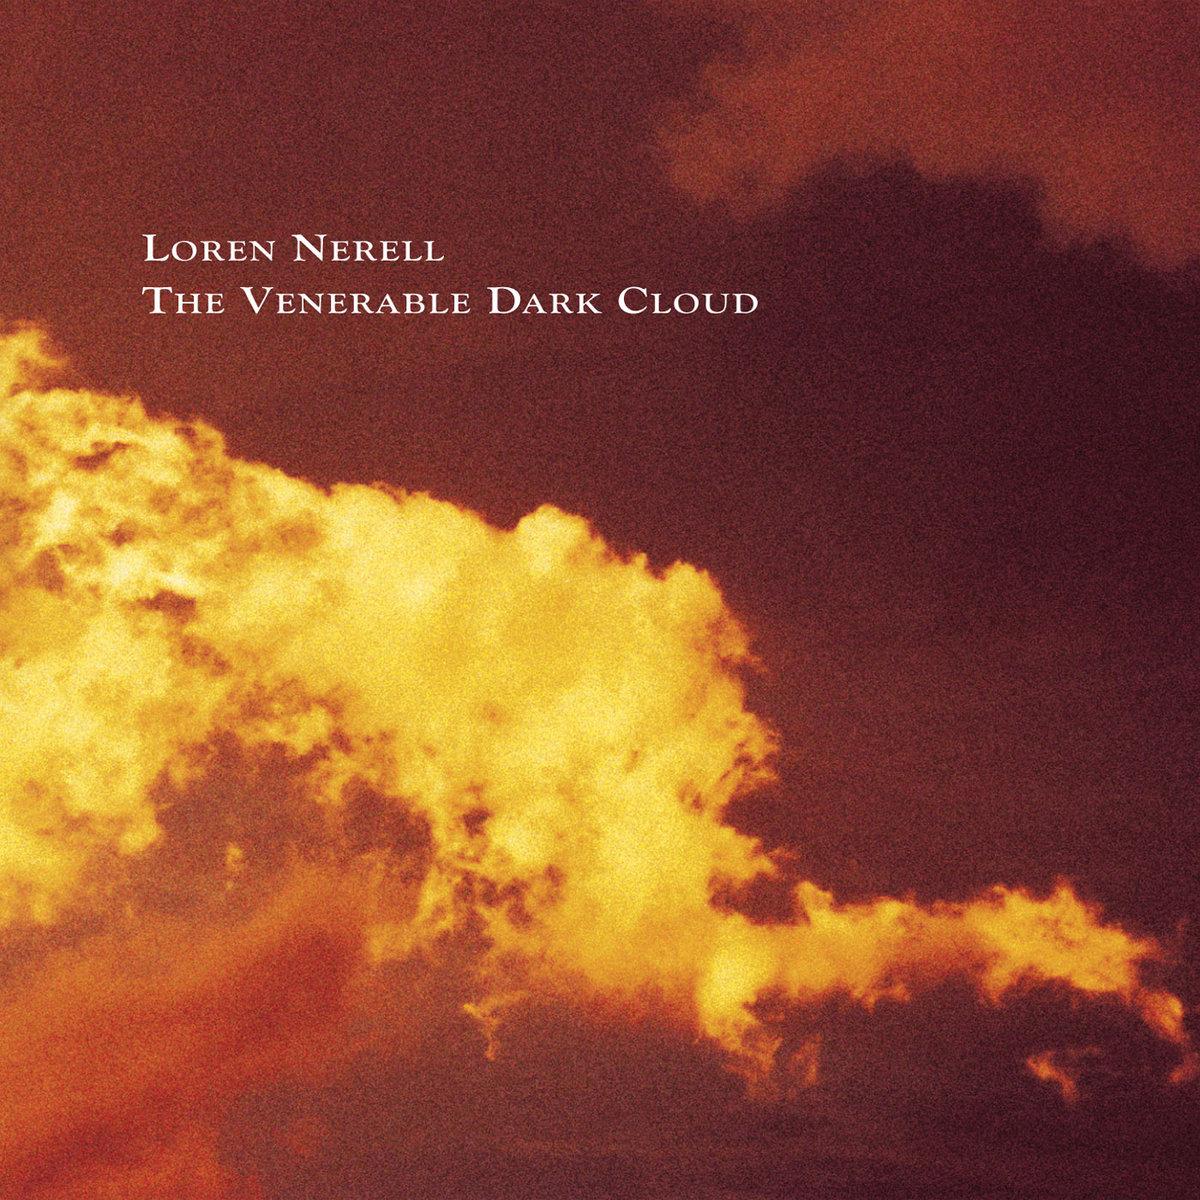 52. Loren Nerell - Liquid Metal Stasis